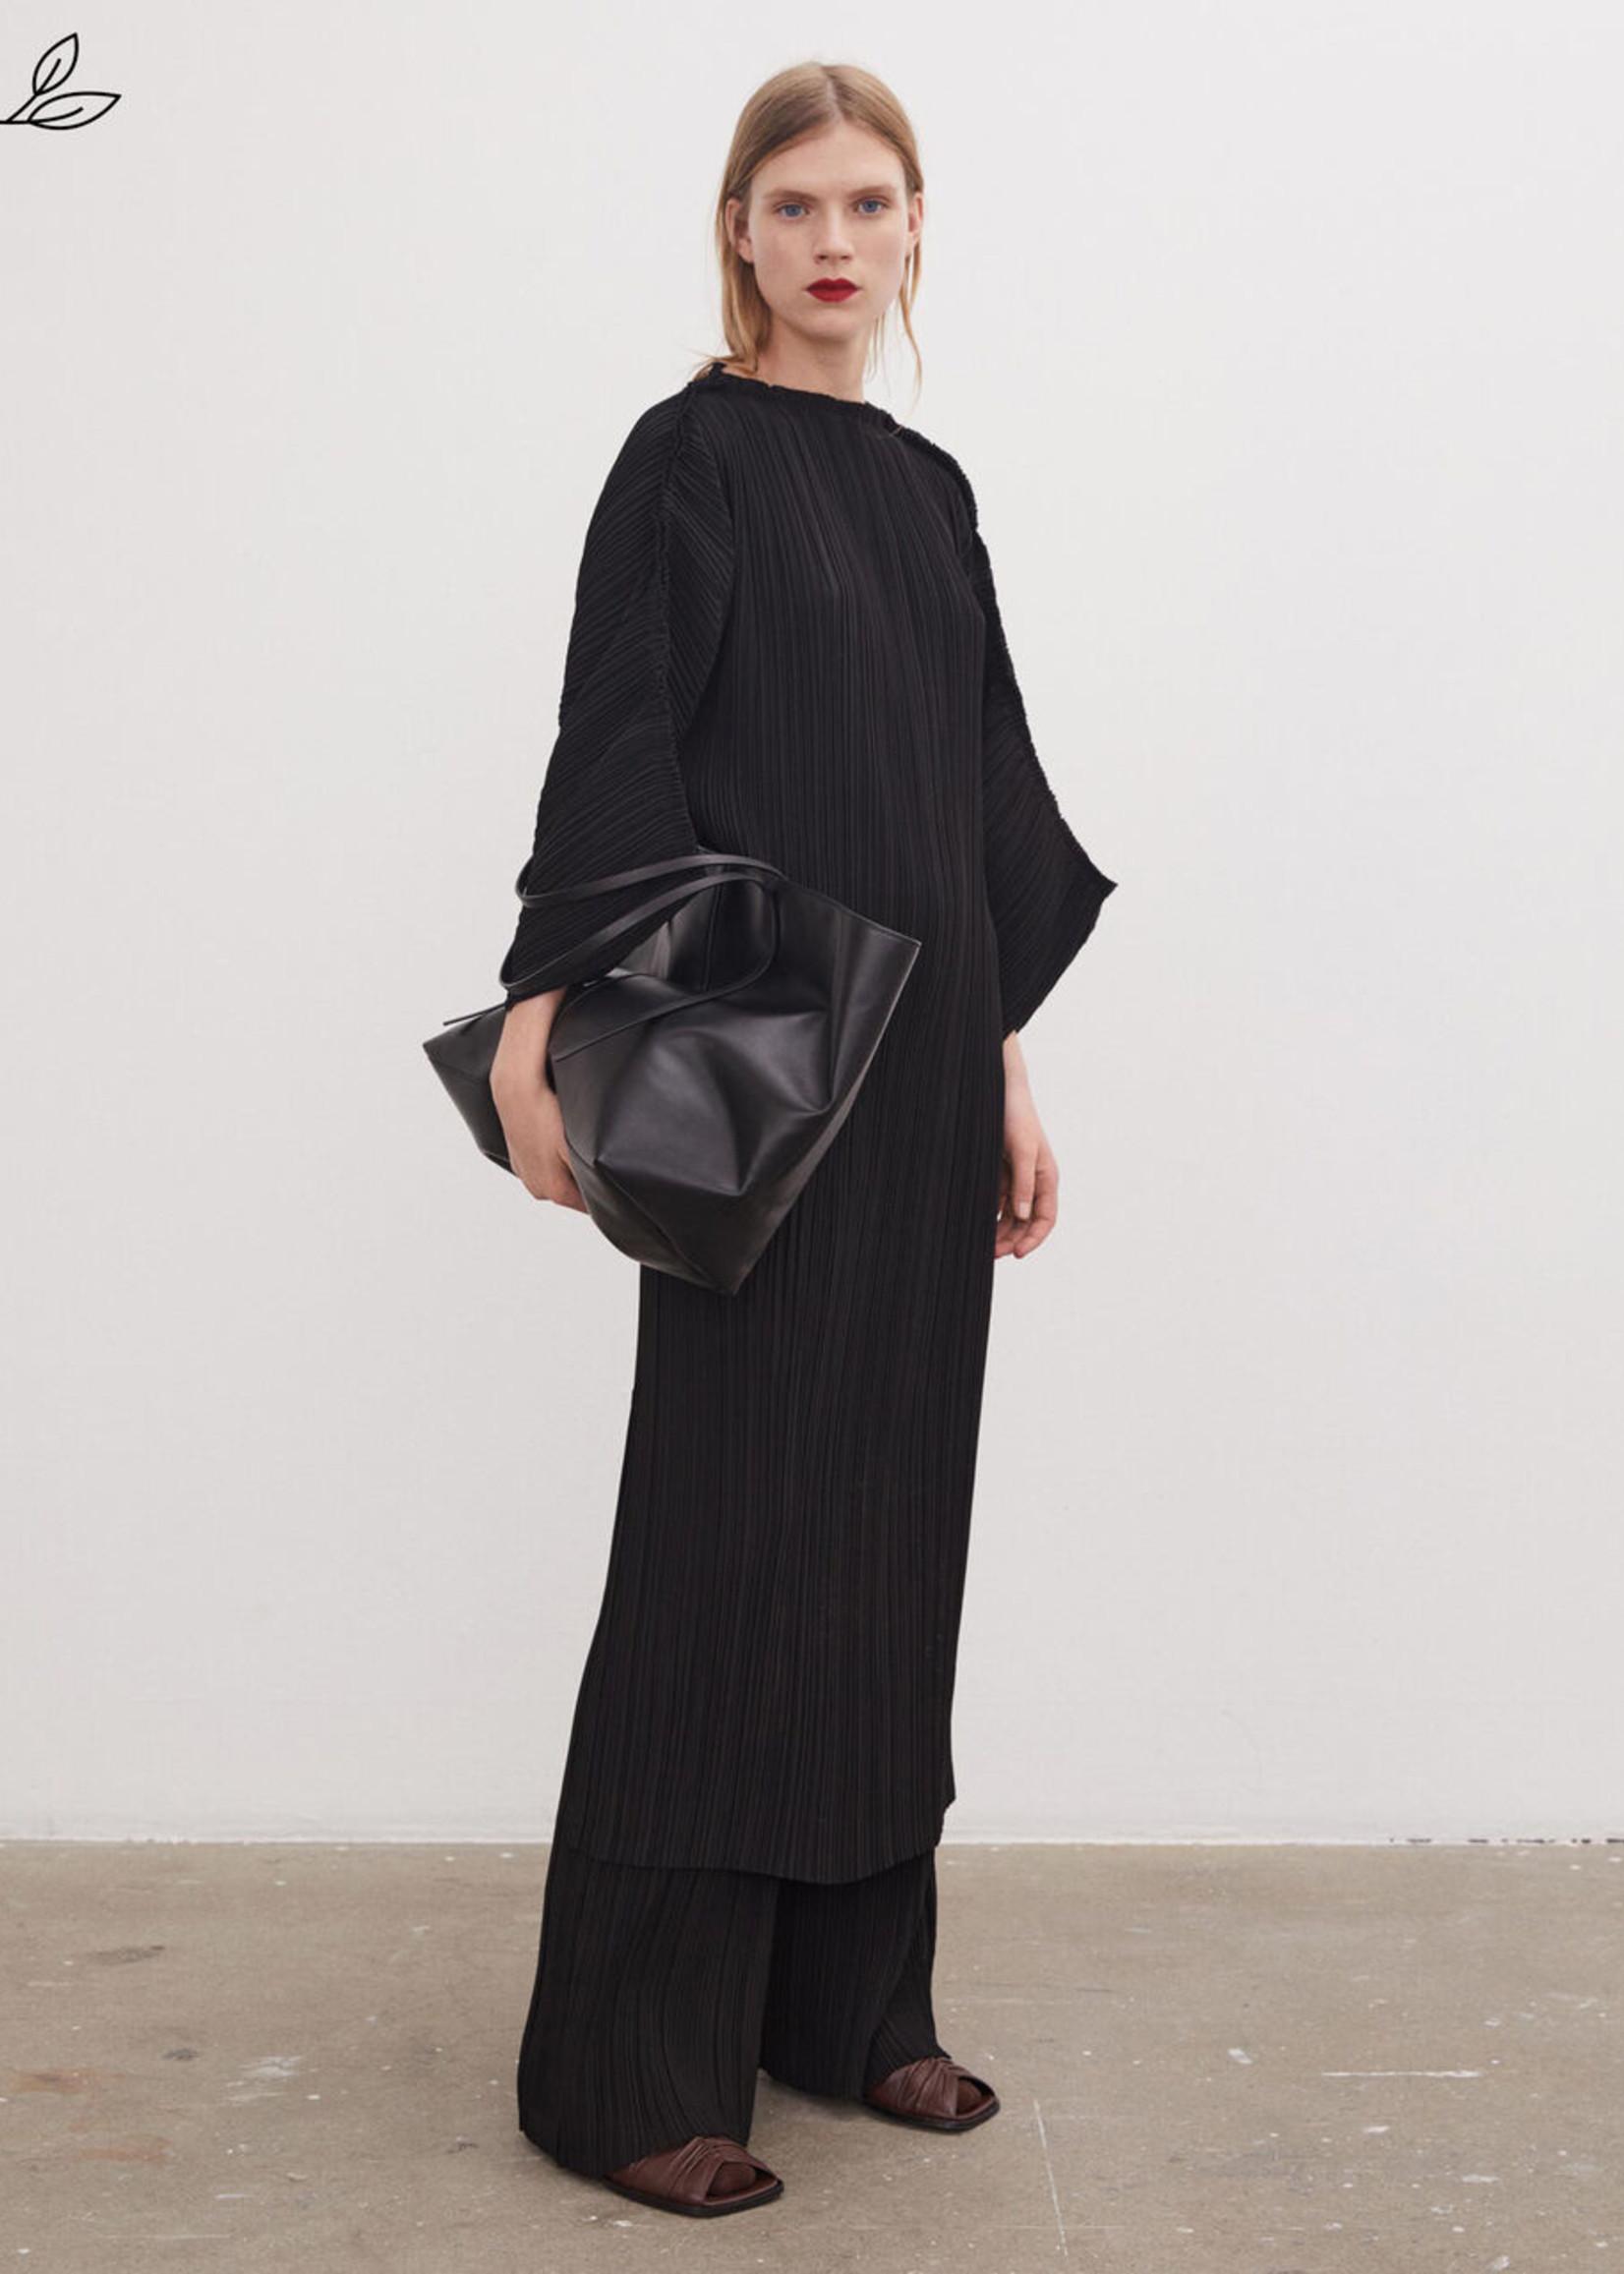 BY MALENE BIRGER TRALAIDO DRESS